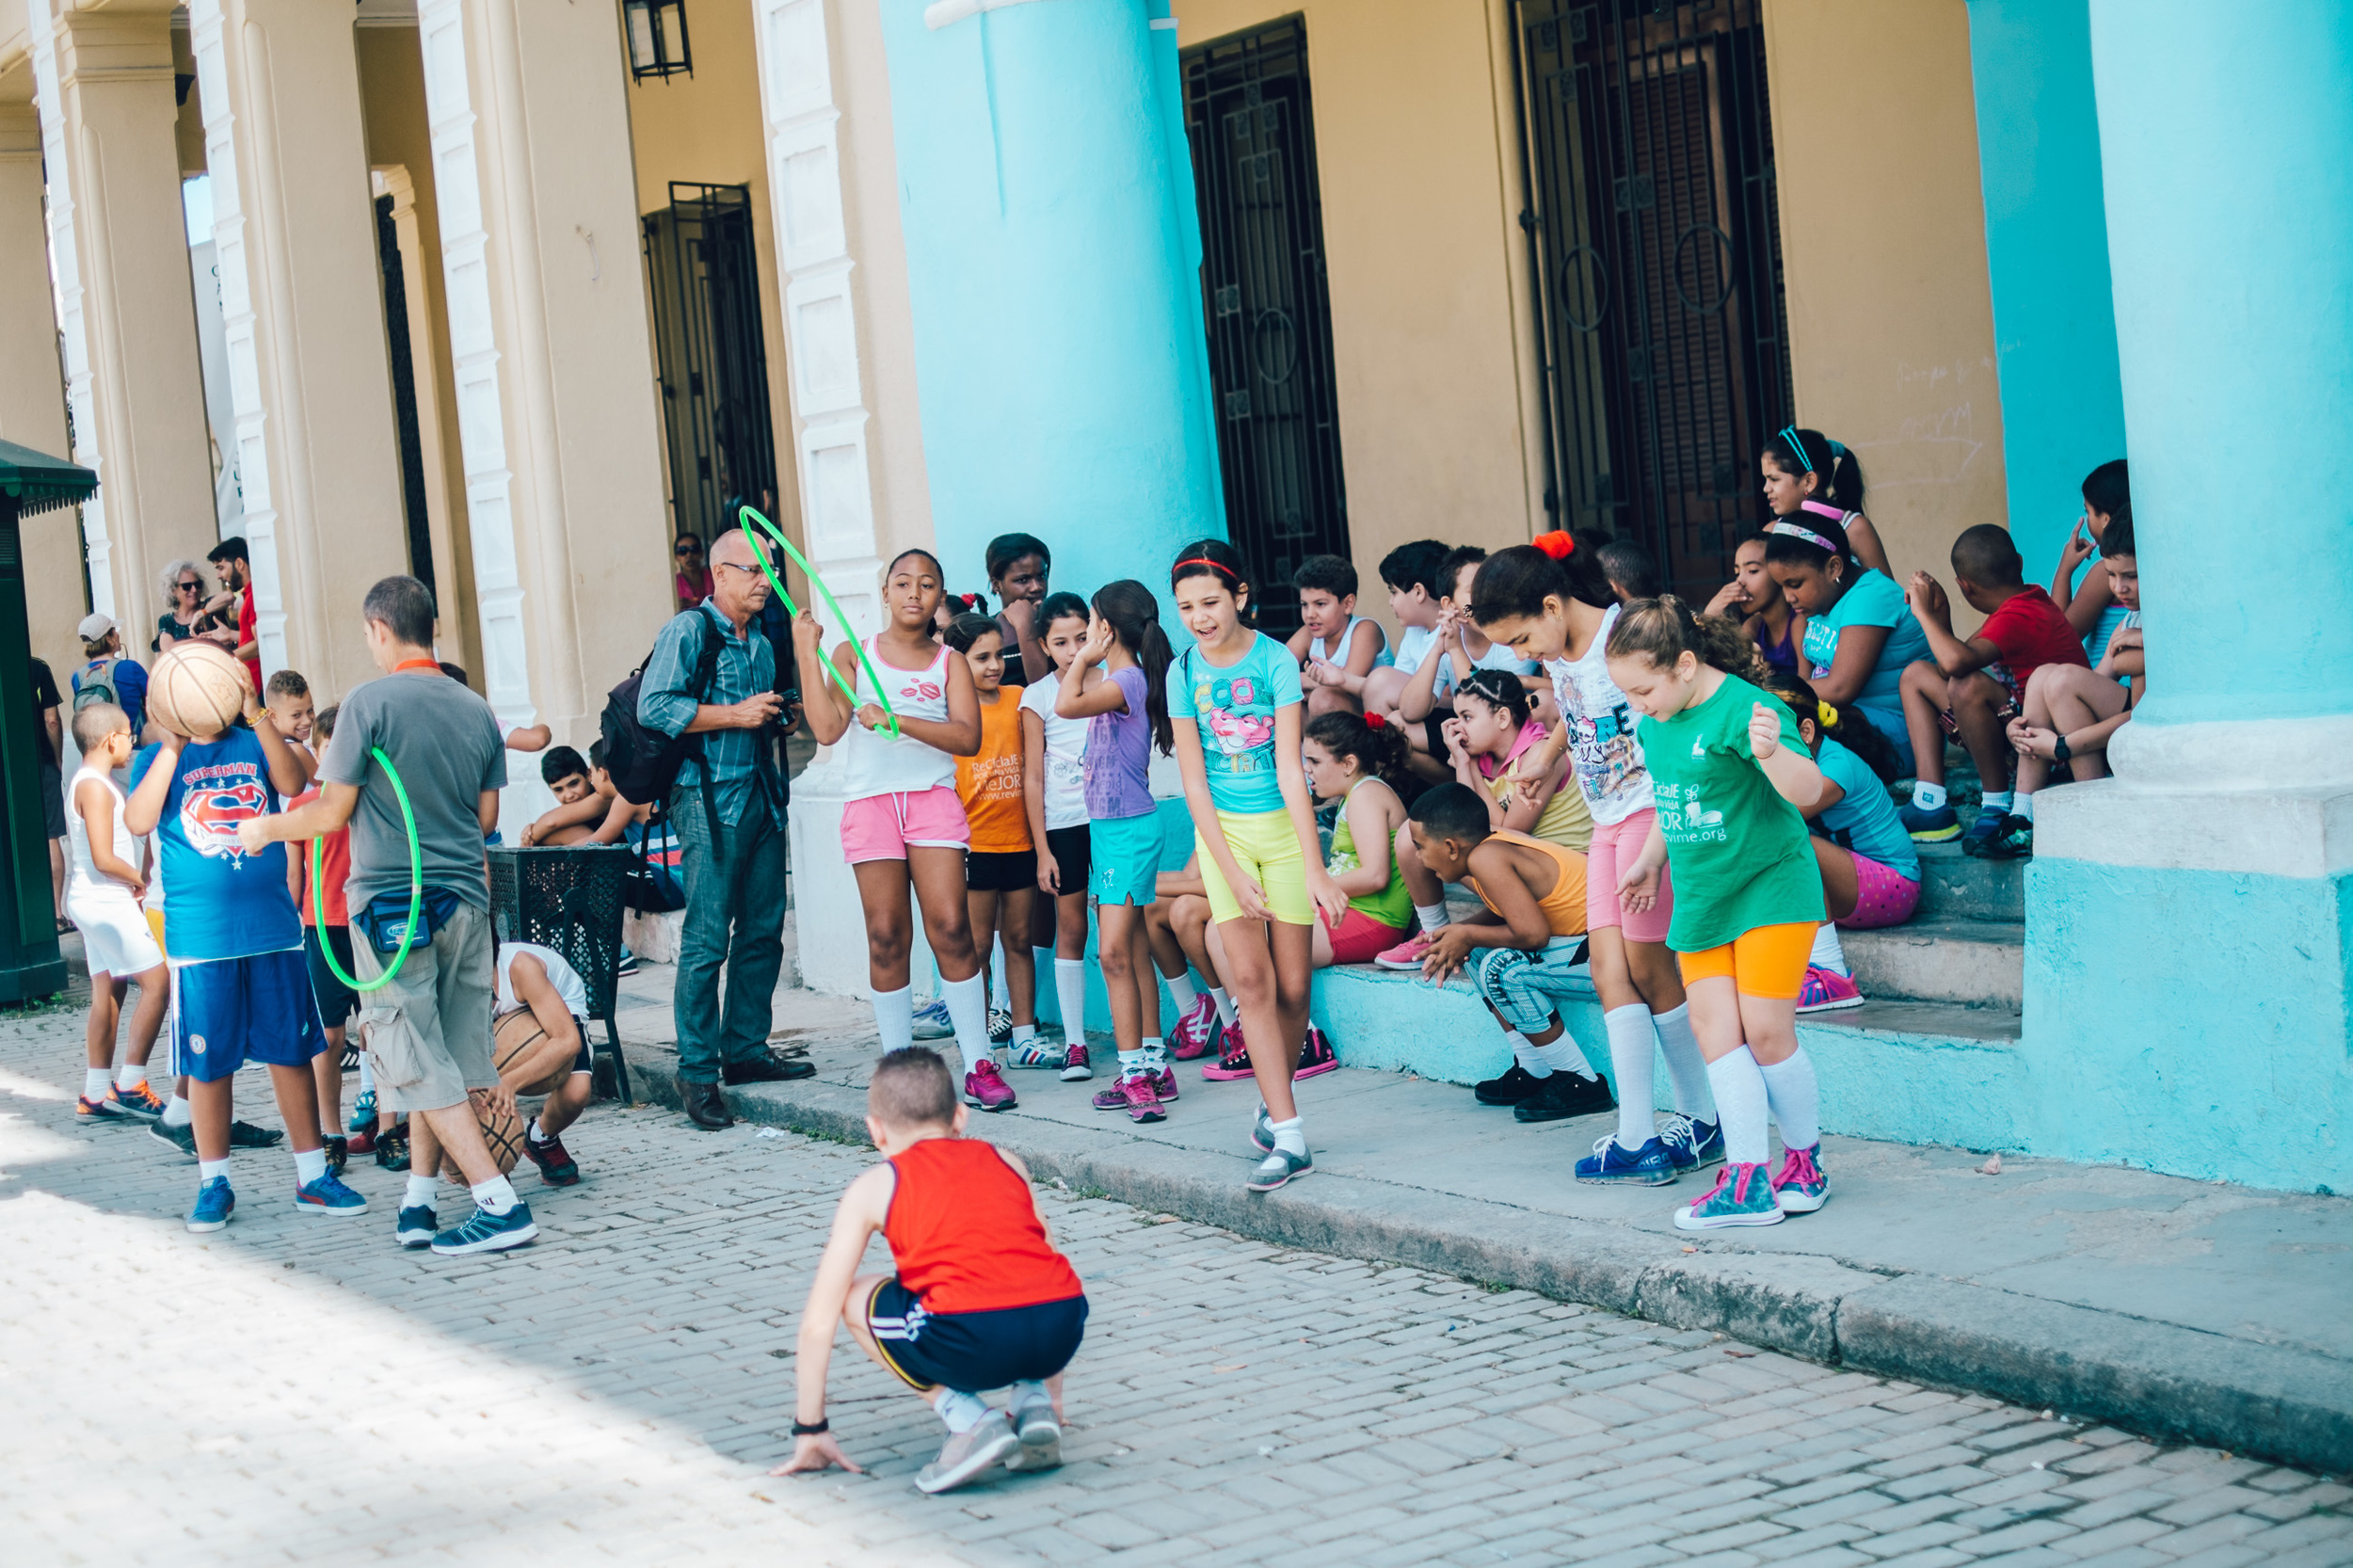 DeClaro-Photography-Cuba-0191.jpg